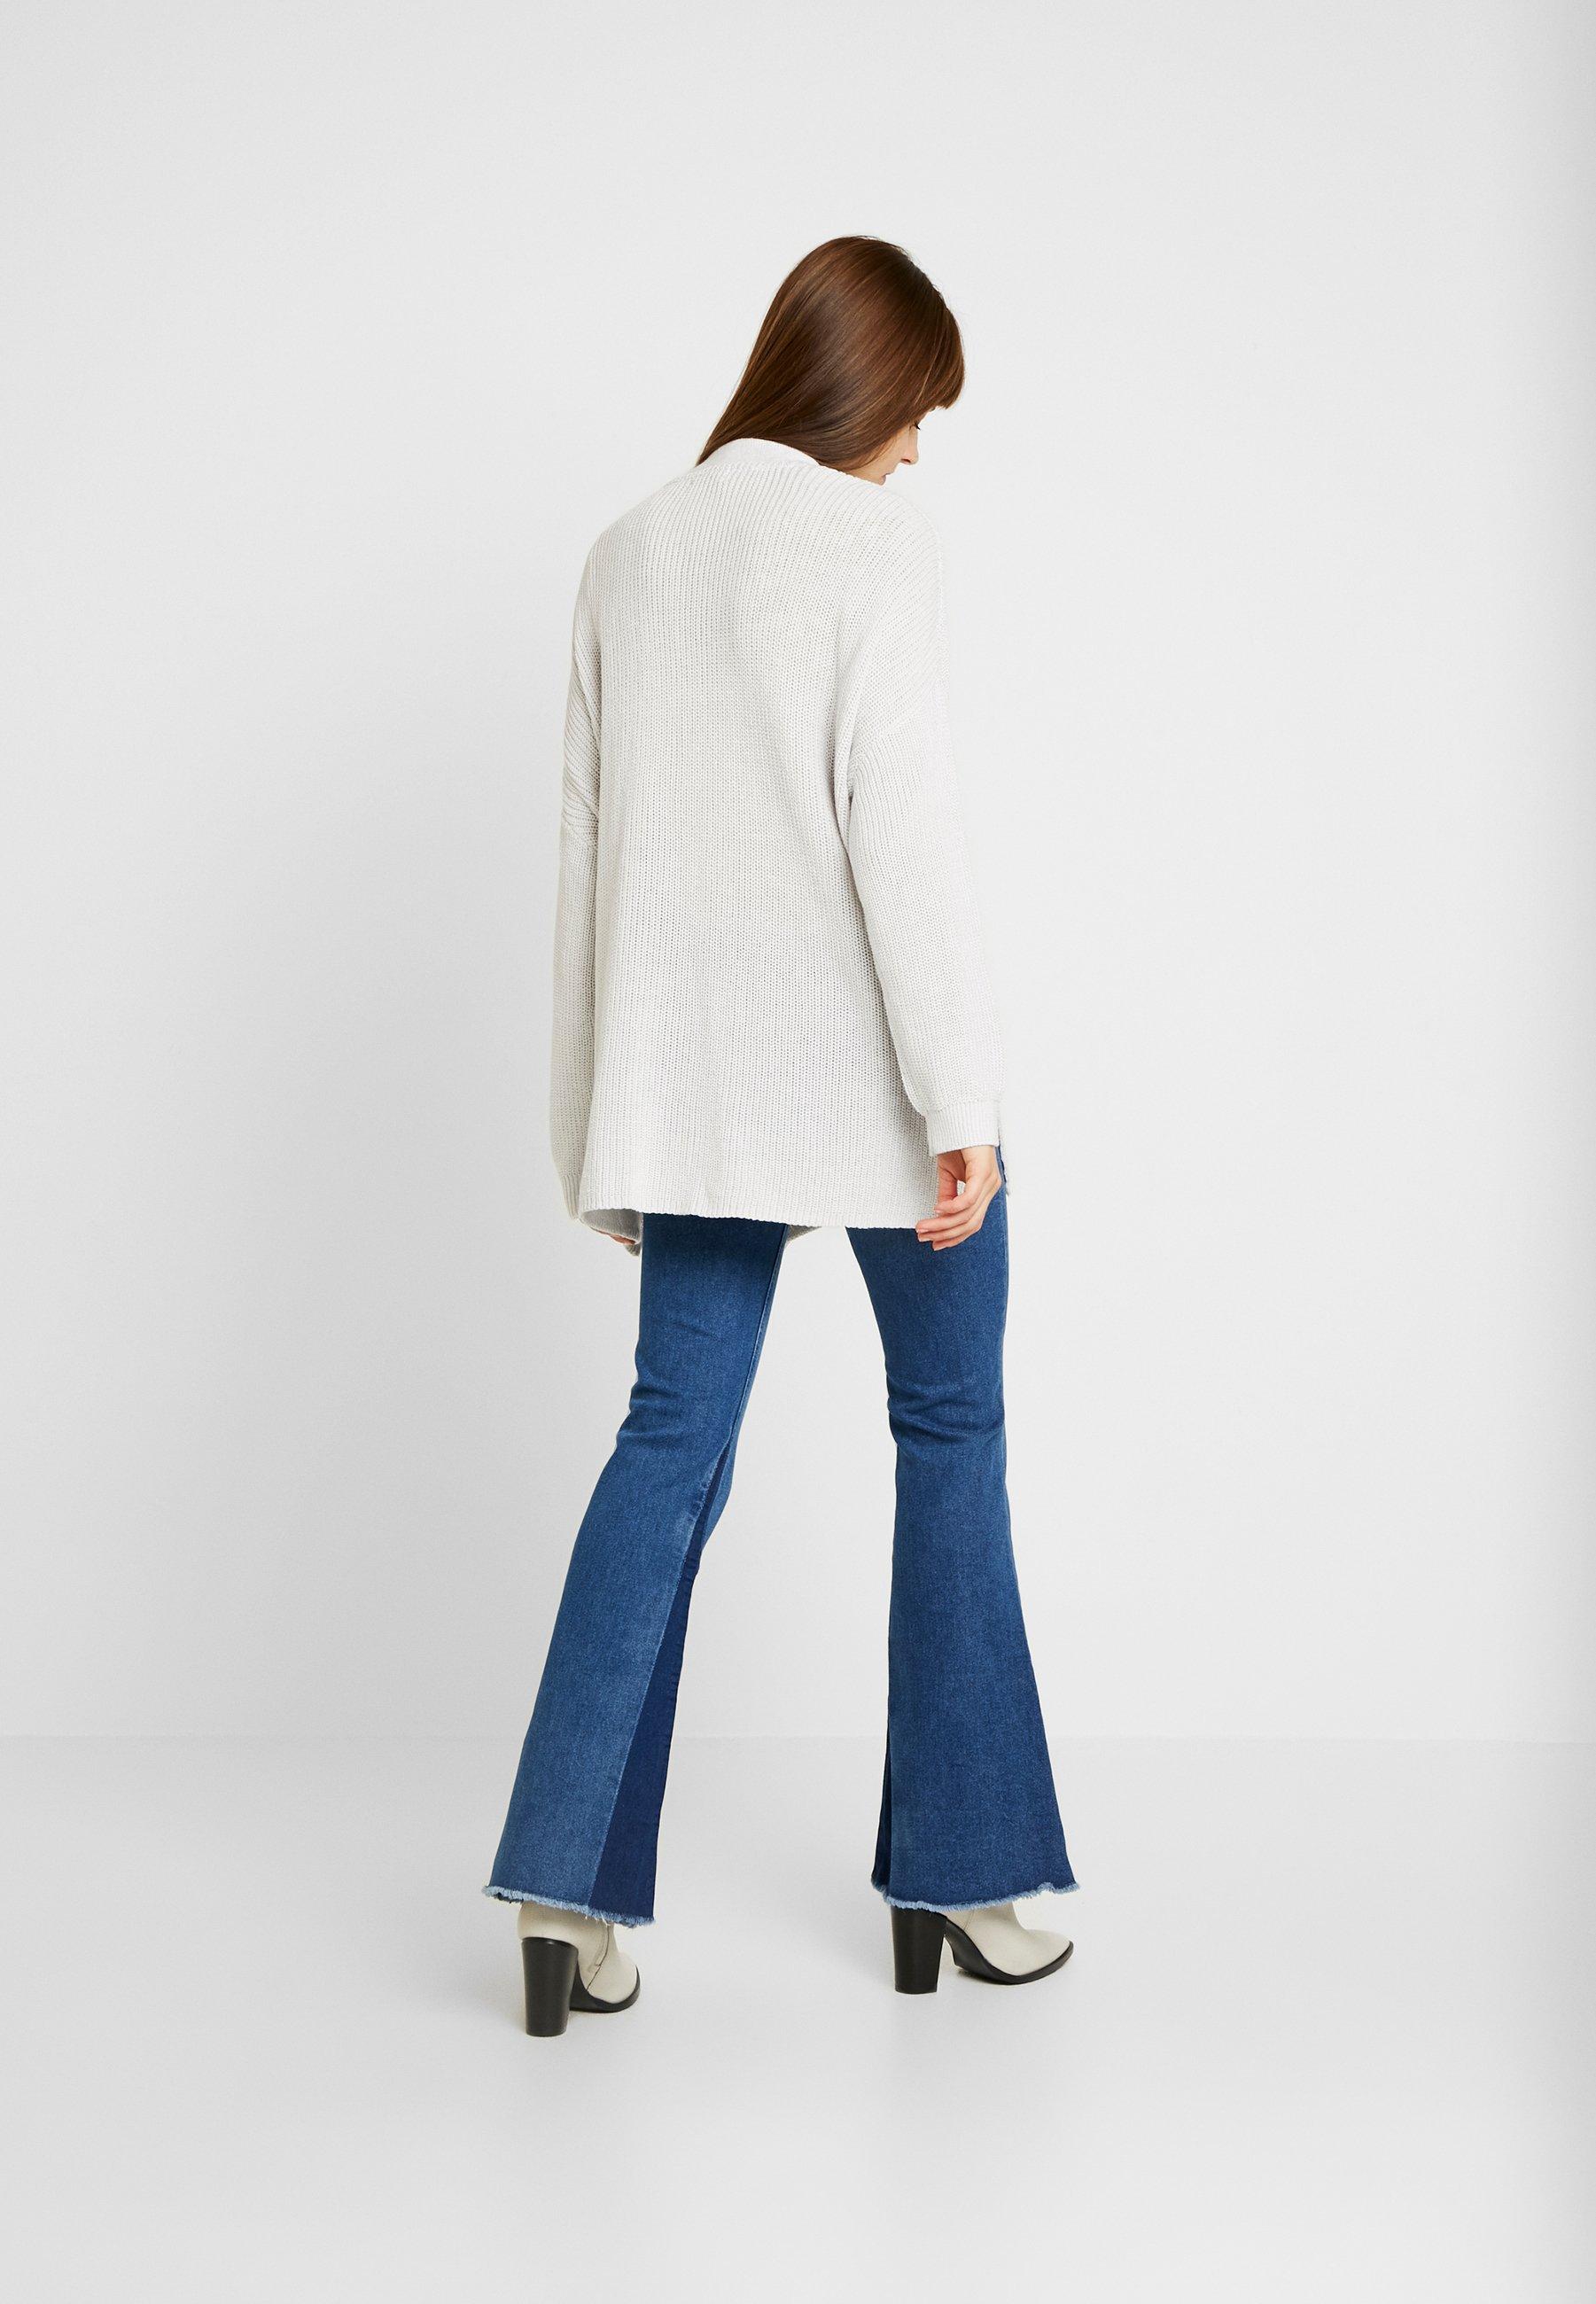 On Twist Cotton Archy CardiganGilet White Windstream htQCsrd